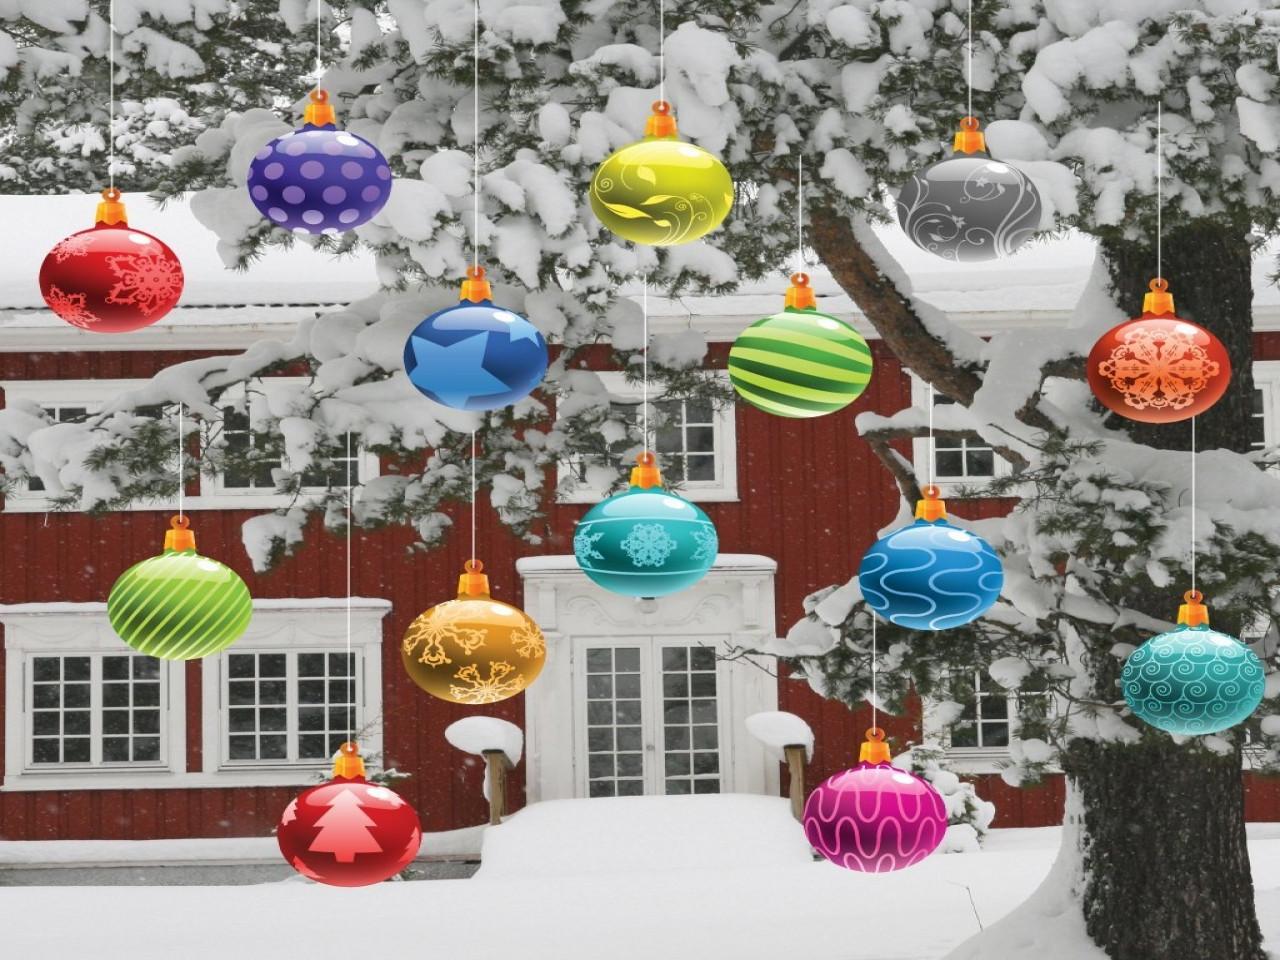 Plastic Outdoor Christmas Decorations Clearance  Snowman home decor outdoor christmas yard decorations